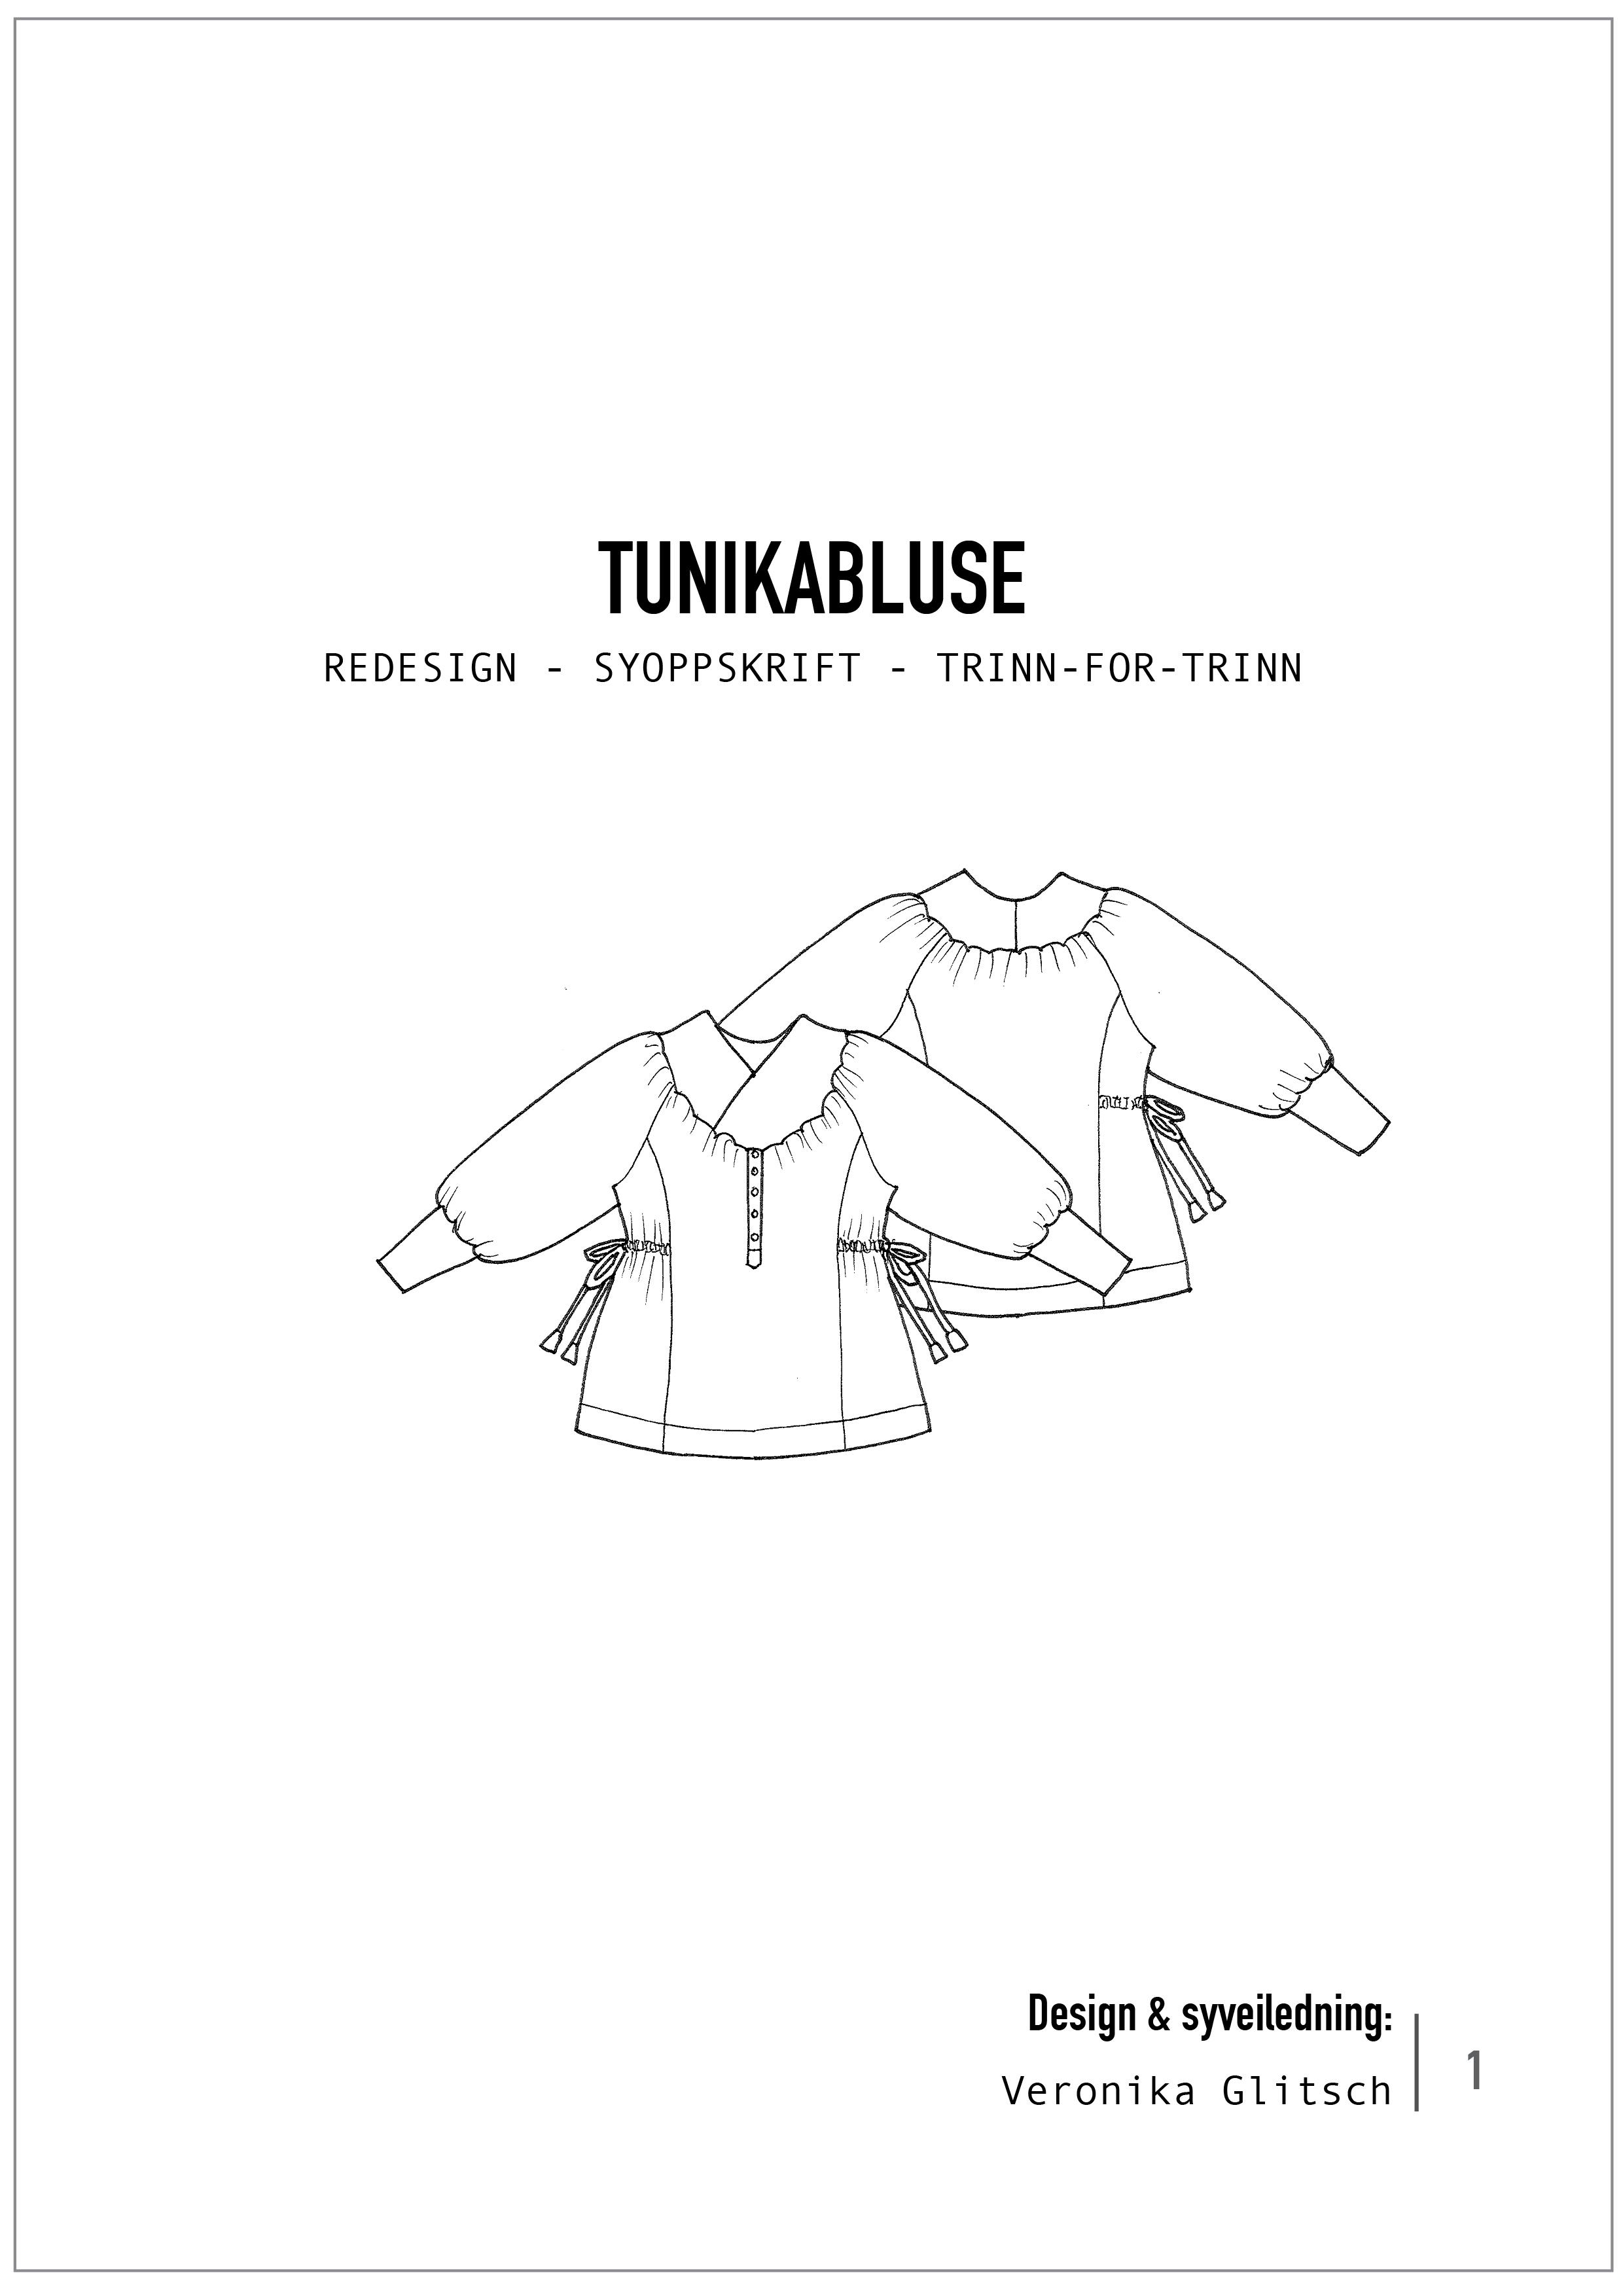 Tunikabluse redesignsyoppskrift blogg